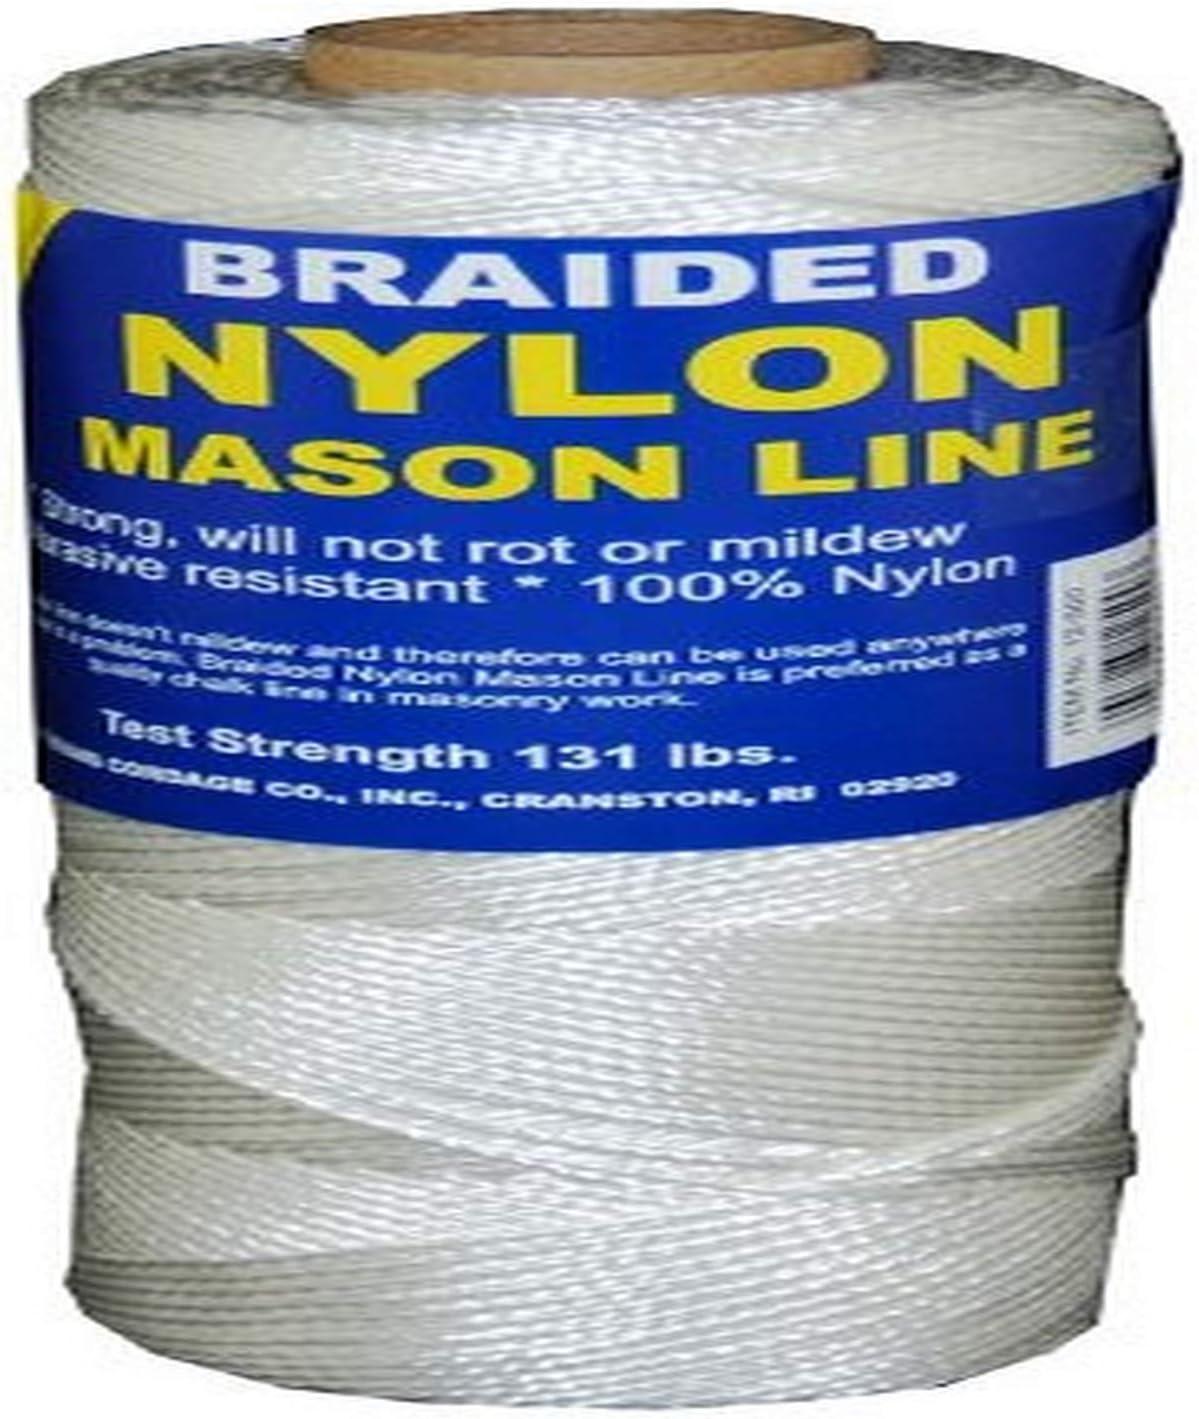 250-Feet T.W Evans Cordage 12-250 Number-1 Braided Nylon Mason Line